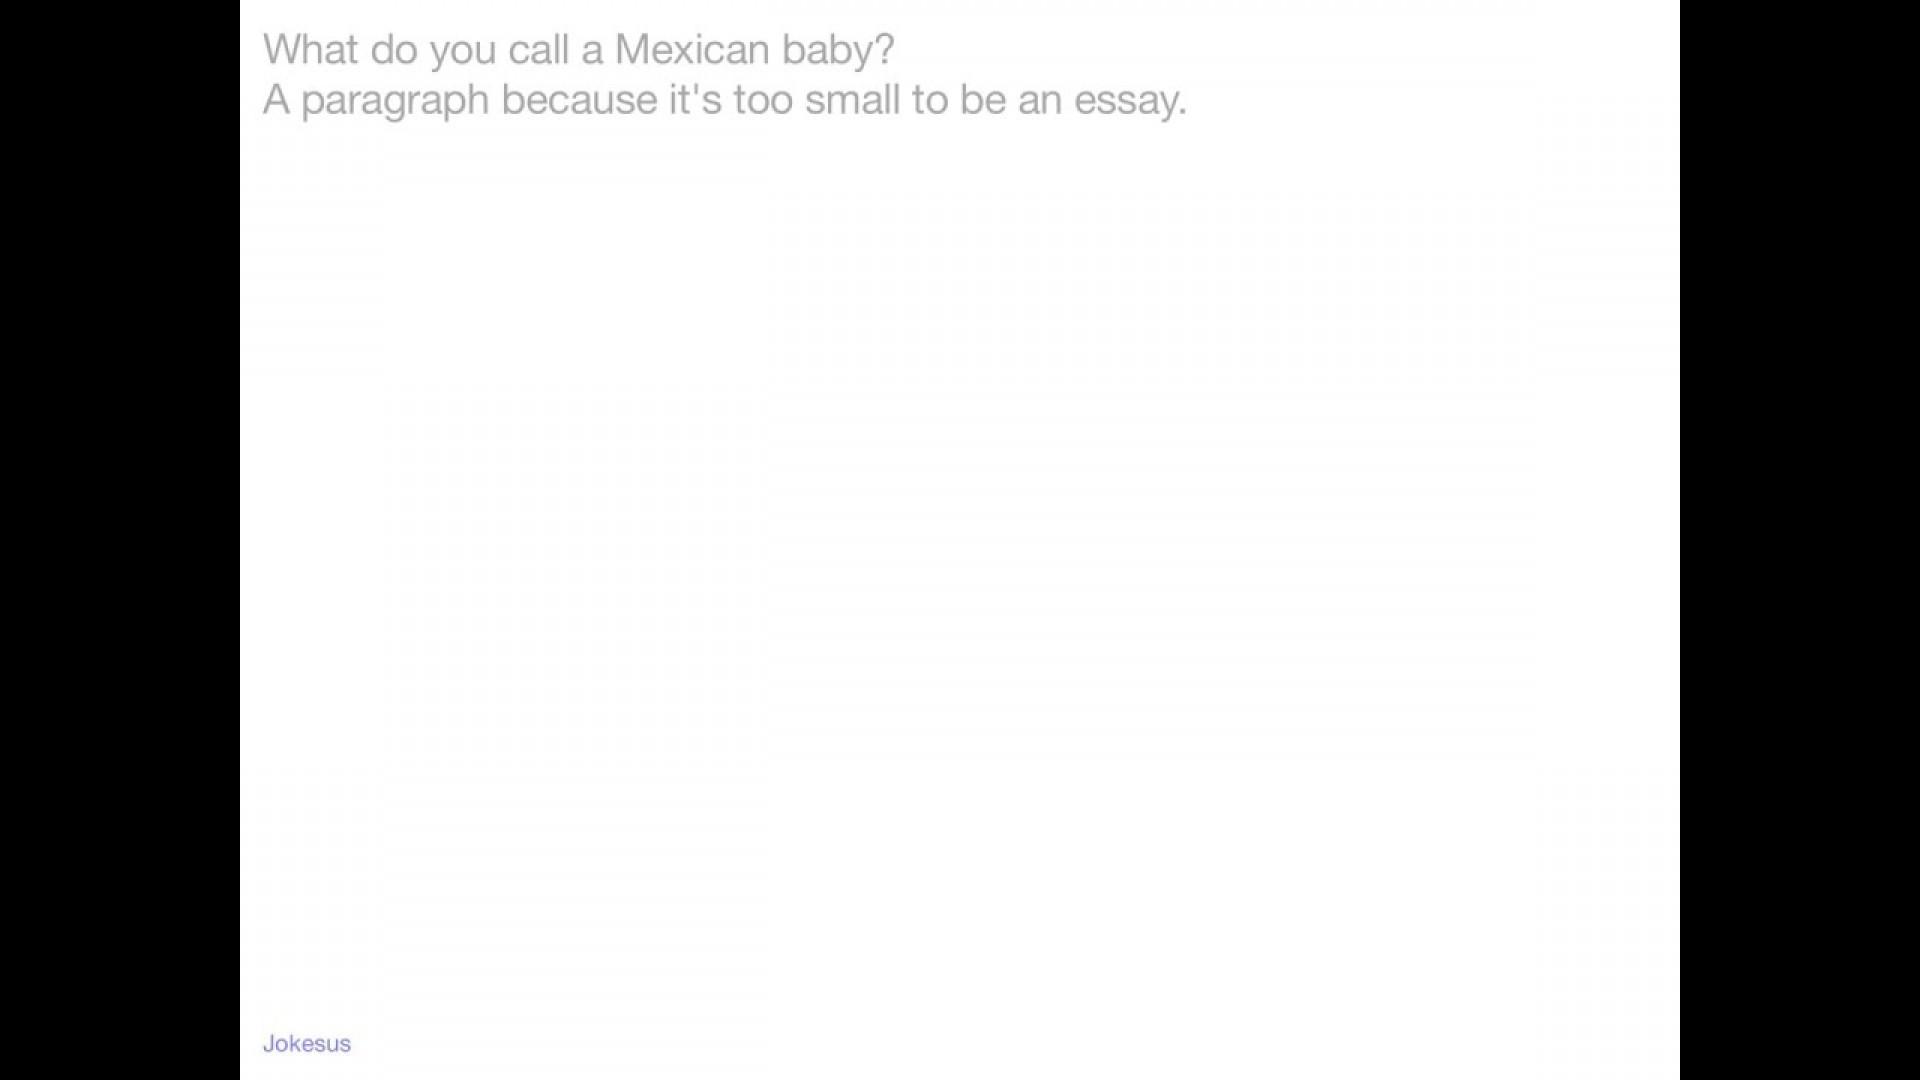 007 Essay Example Mexican Joke Impressive 1920